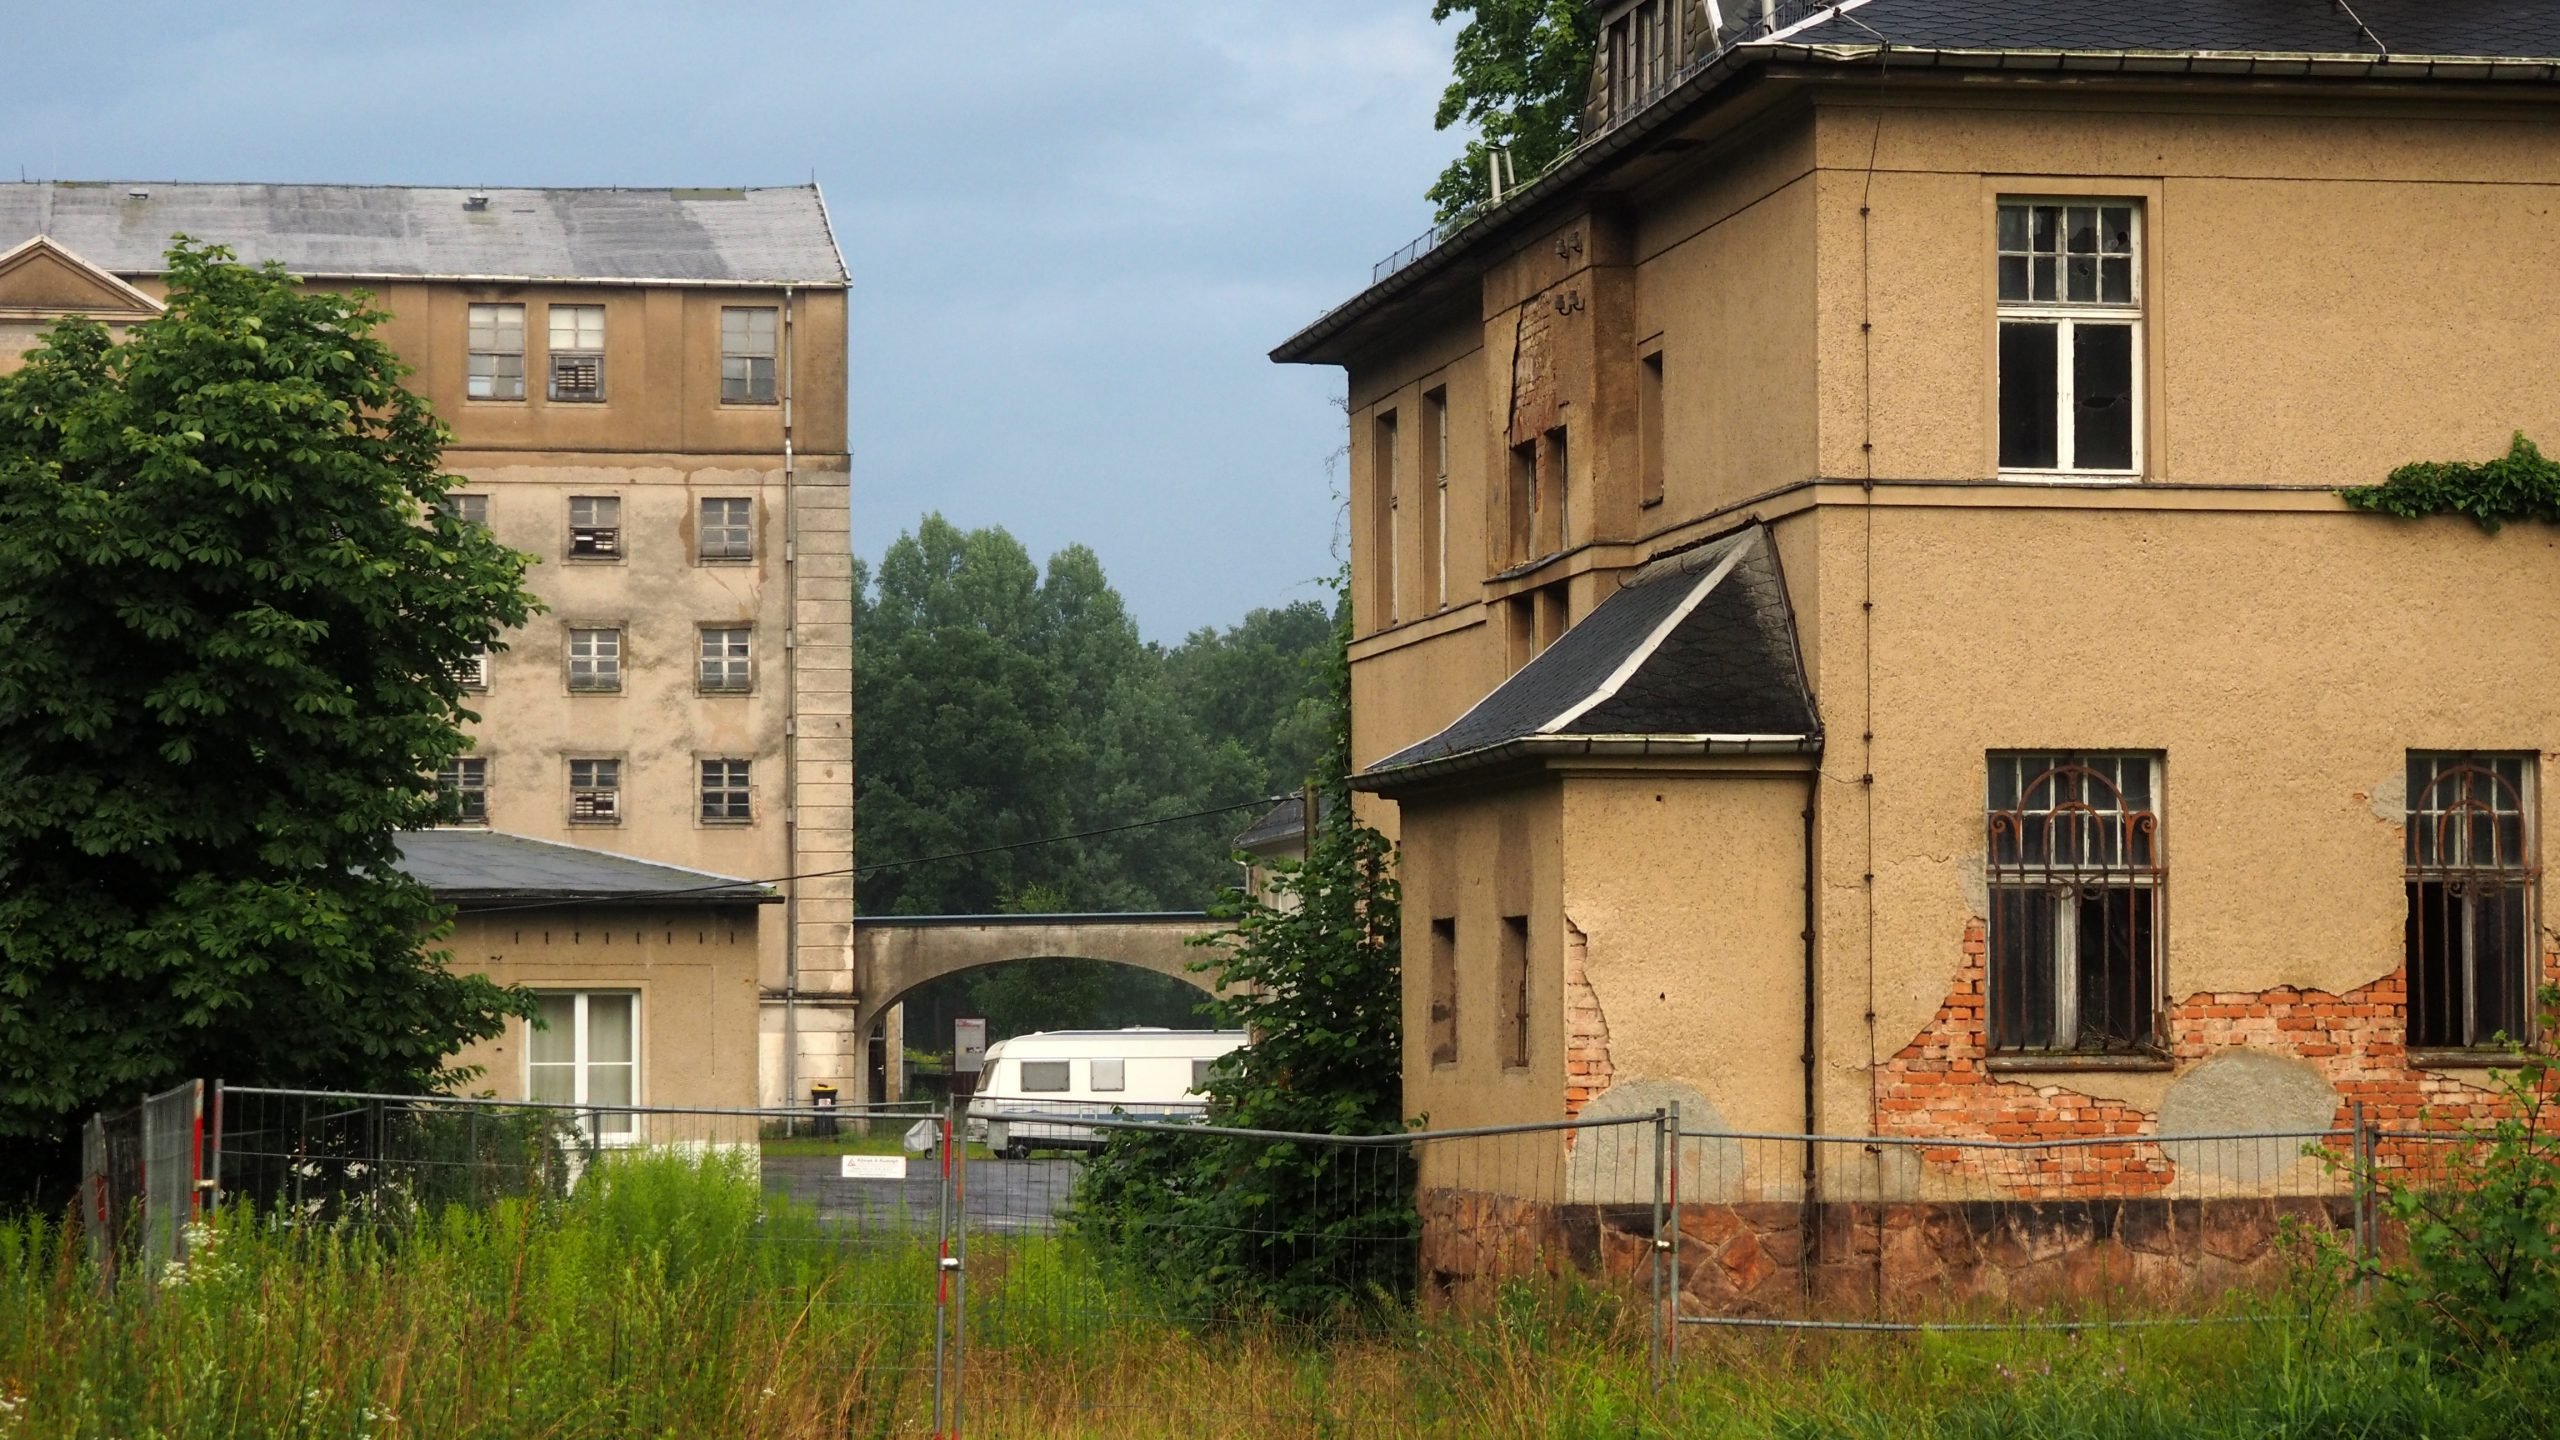 Kommandantenvilla und Rückseite der Fabrik. Foto: sLAG